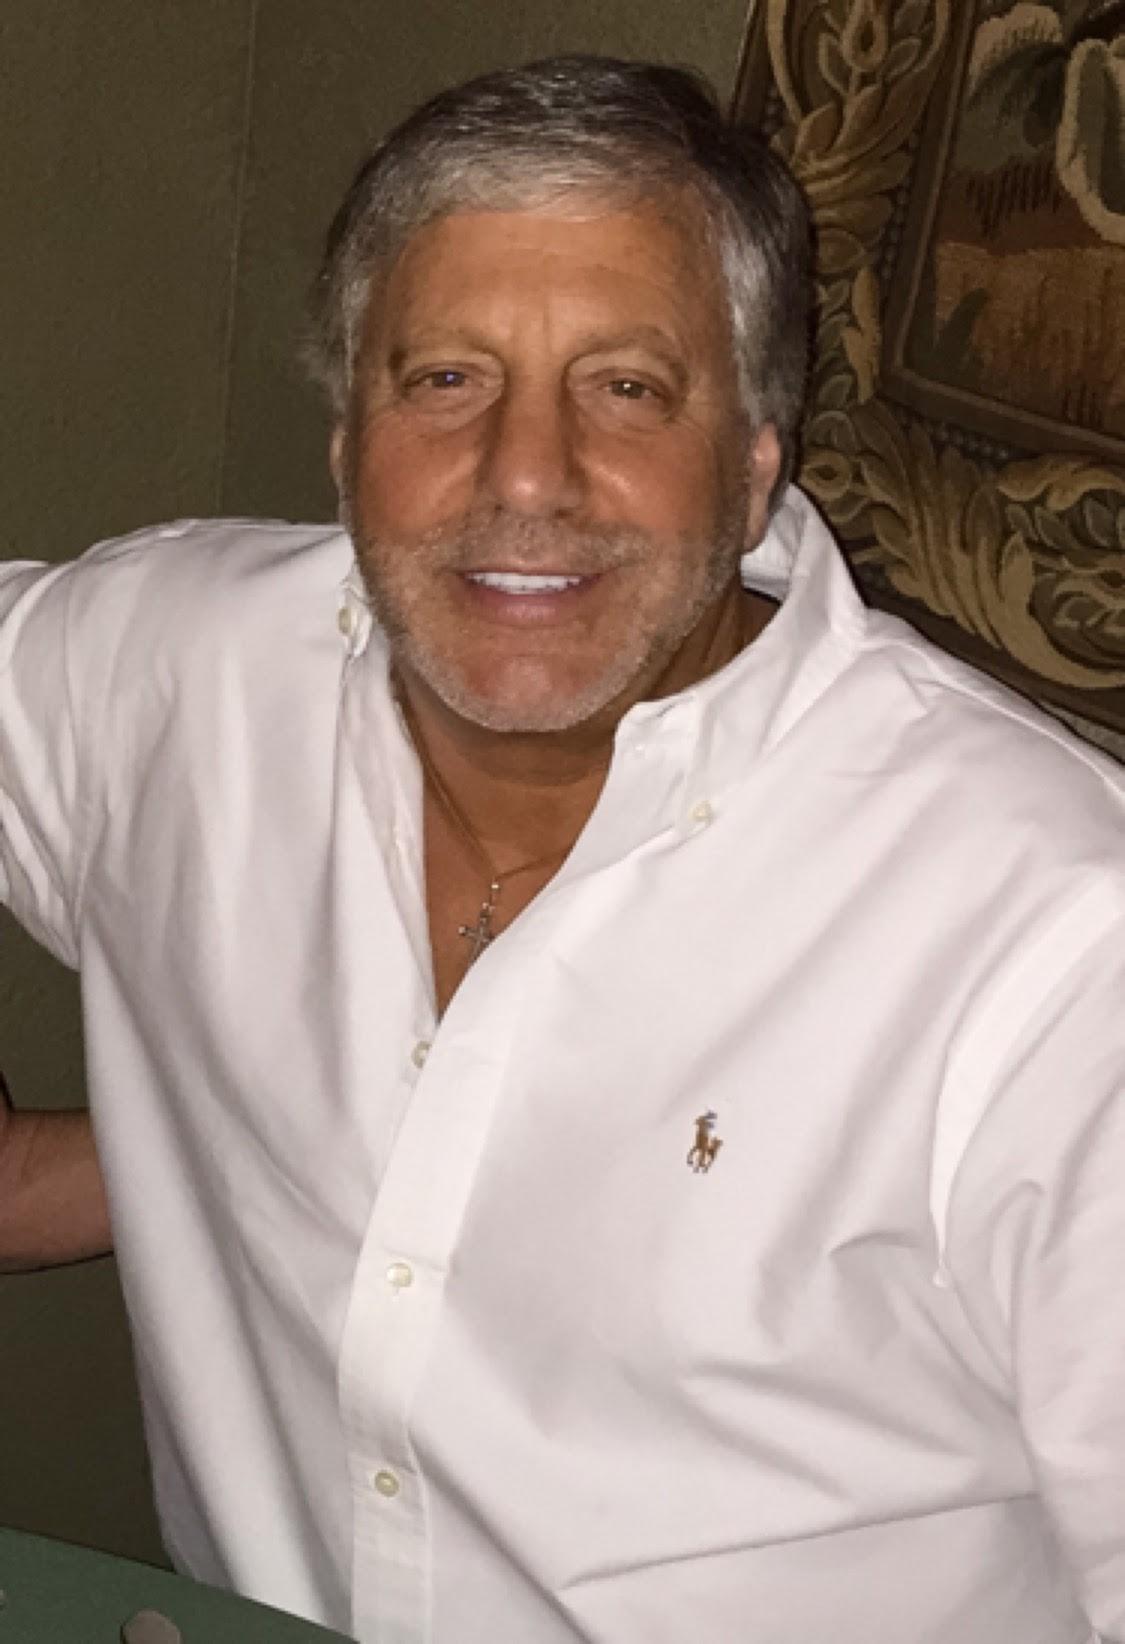 Frank Greico